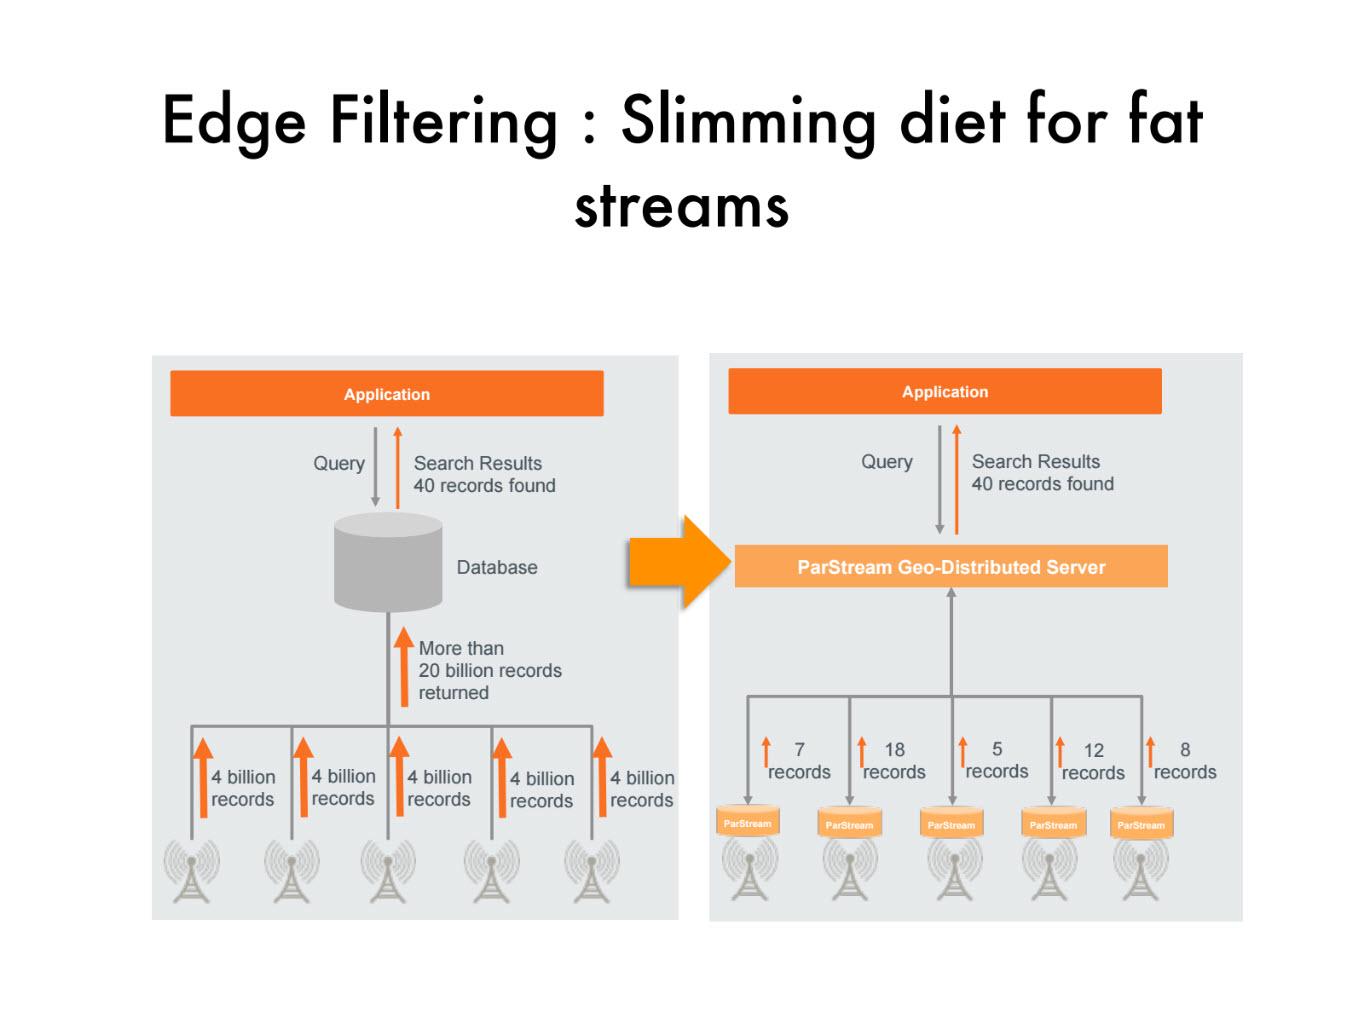 Venu Vasudevan IIoT Predix Predictive Analytics 2 Edge Filtering lambda architecture